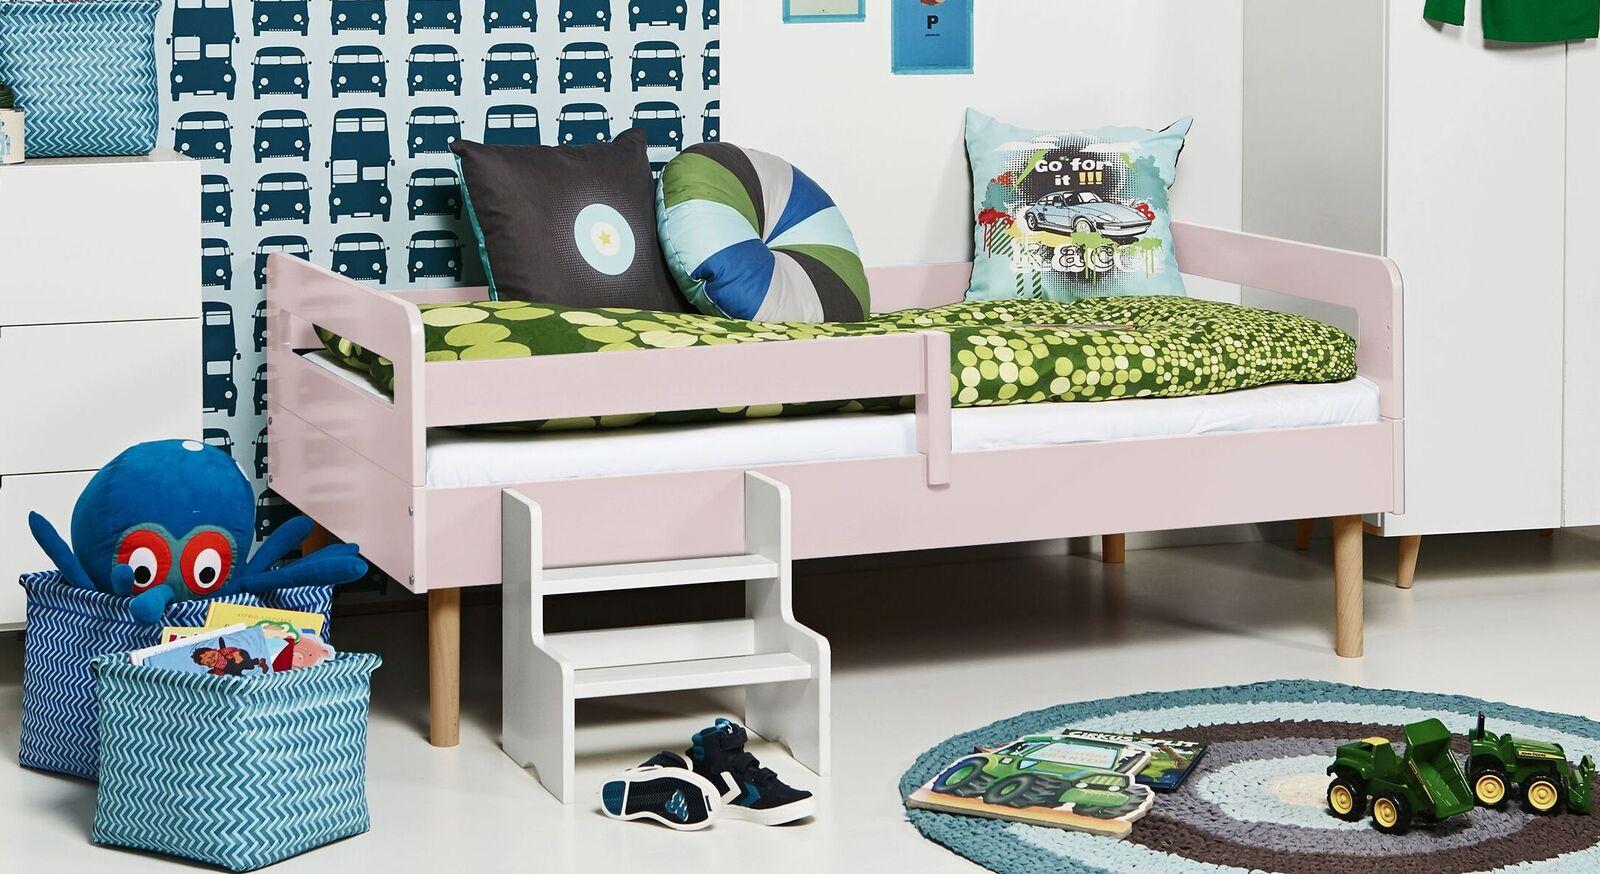 Modernes Kinderbett Kids Town Retro aus hellrosanem MDF